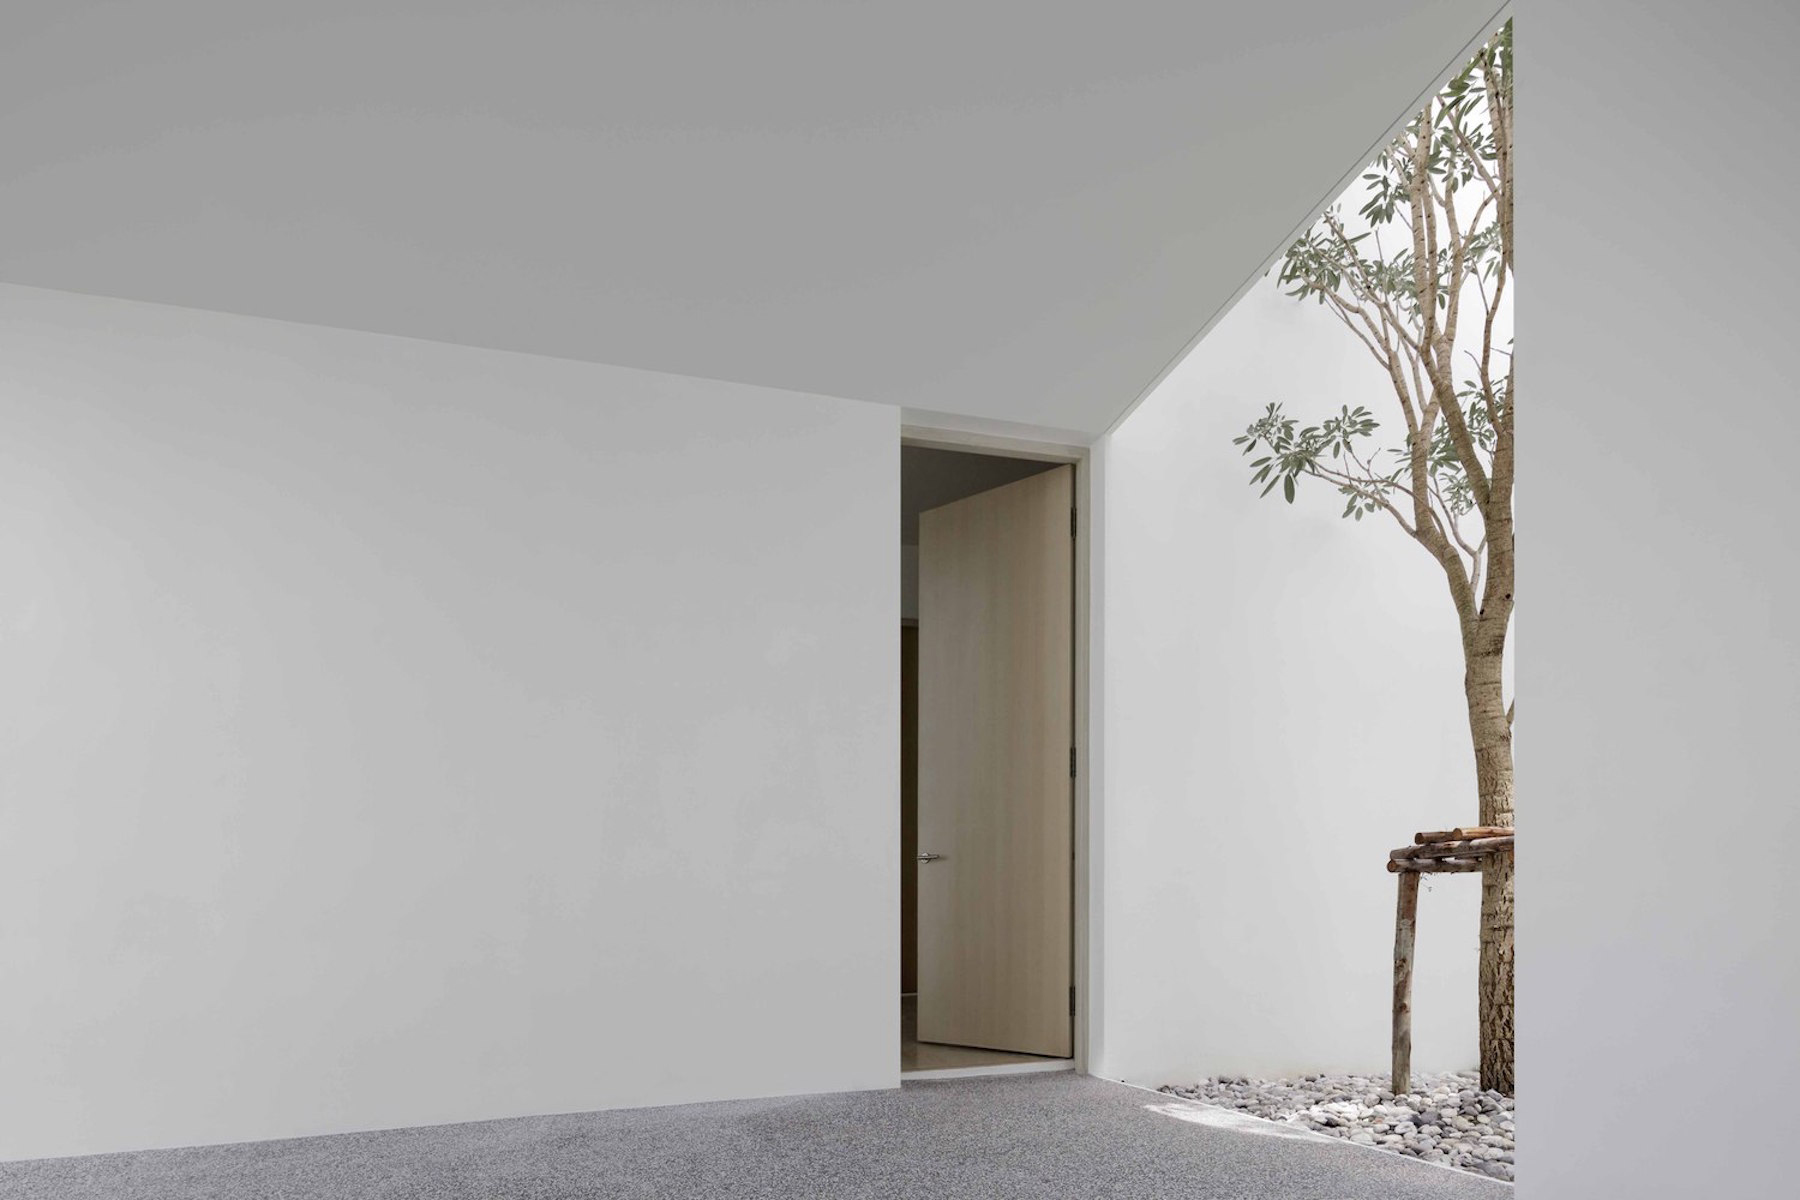 iGNANT-Architecture-Ayutt-And-Associates-Design-White-Box-House-02